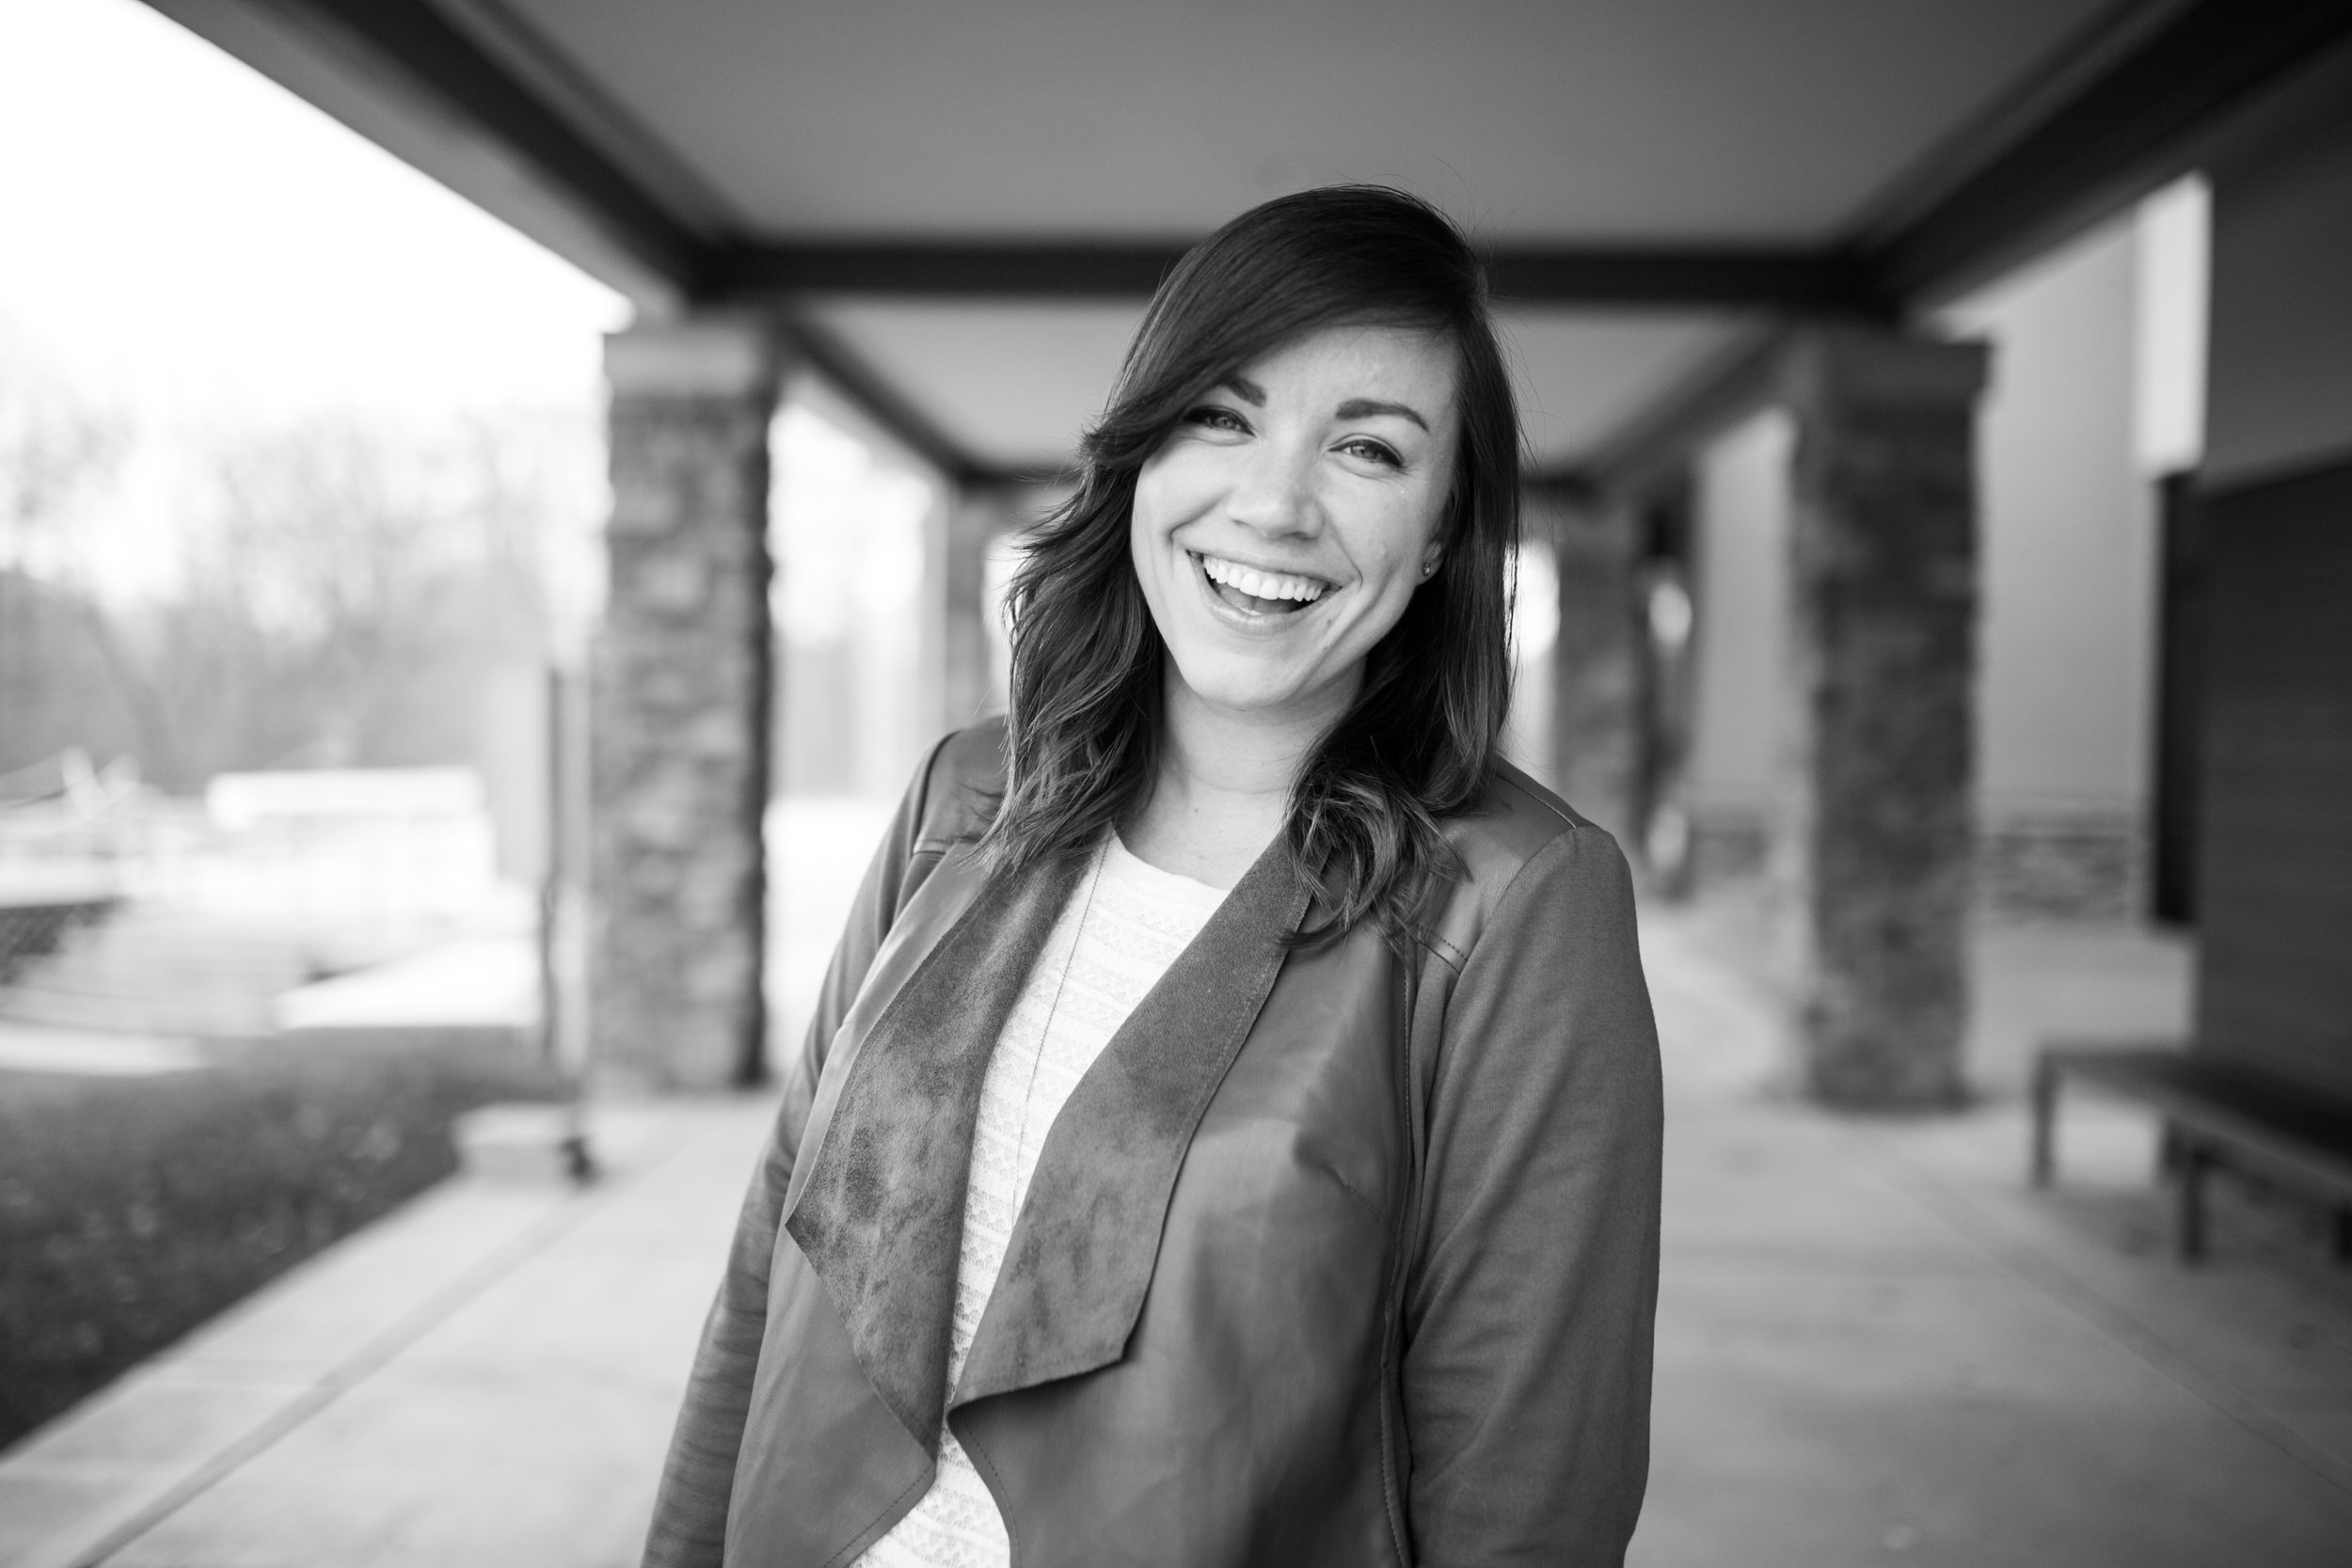 Laura Briggs | Art Director & Photographer